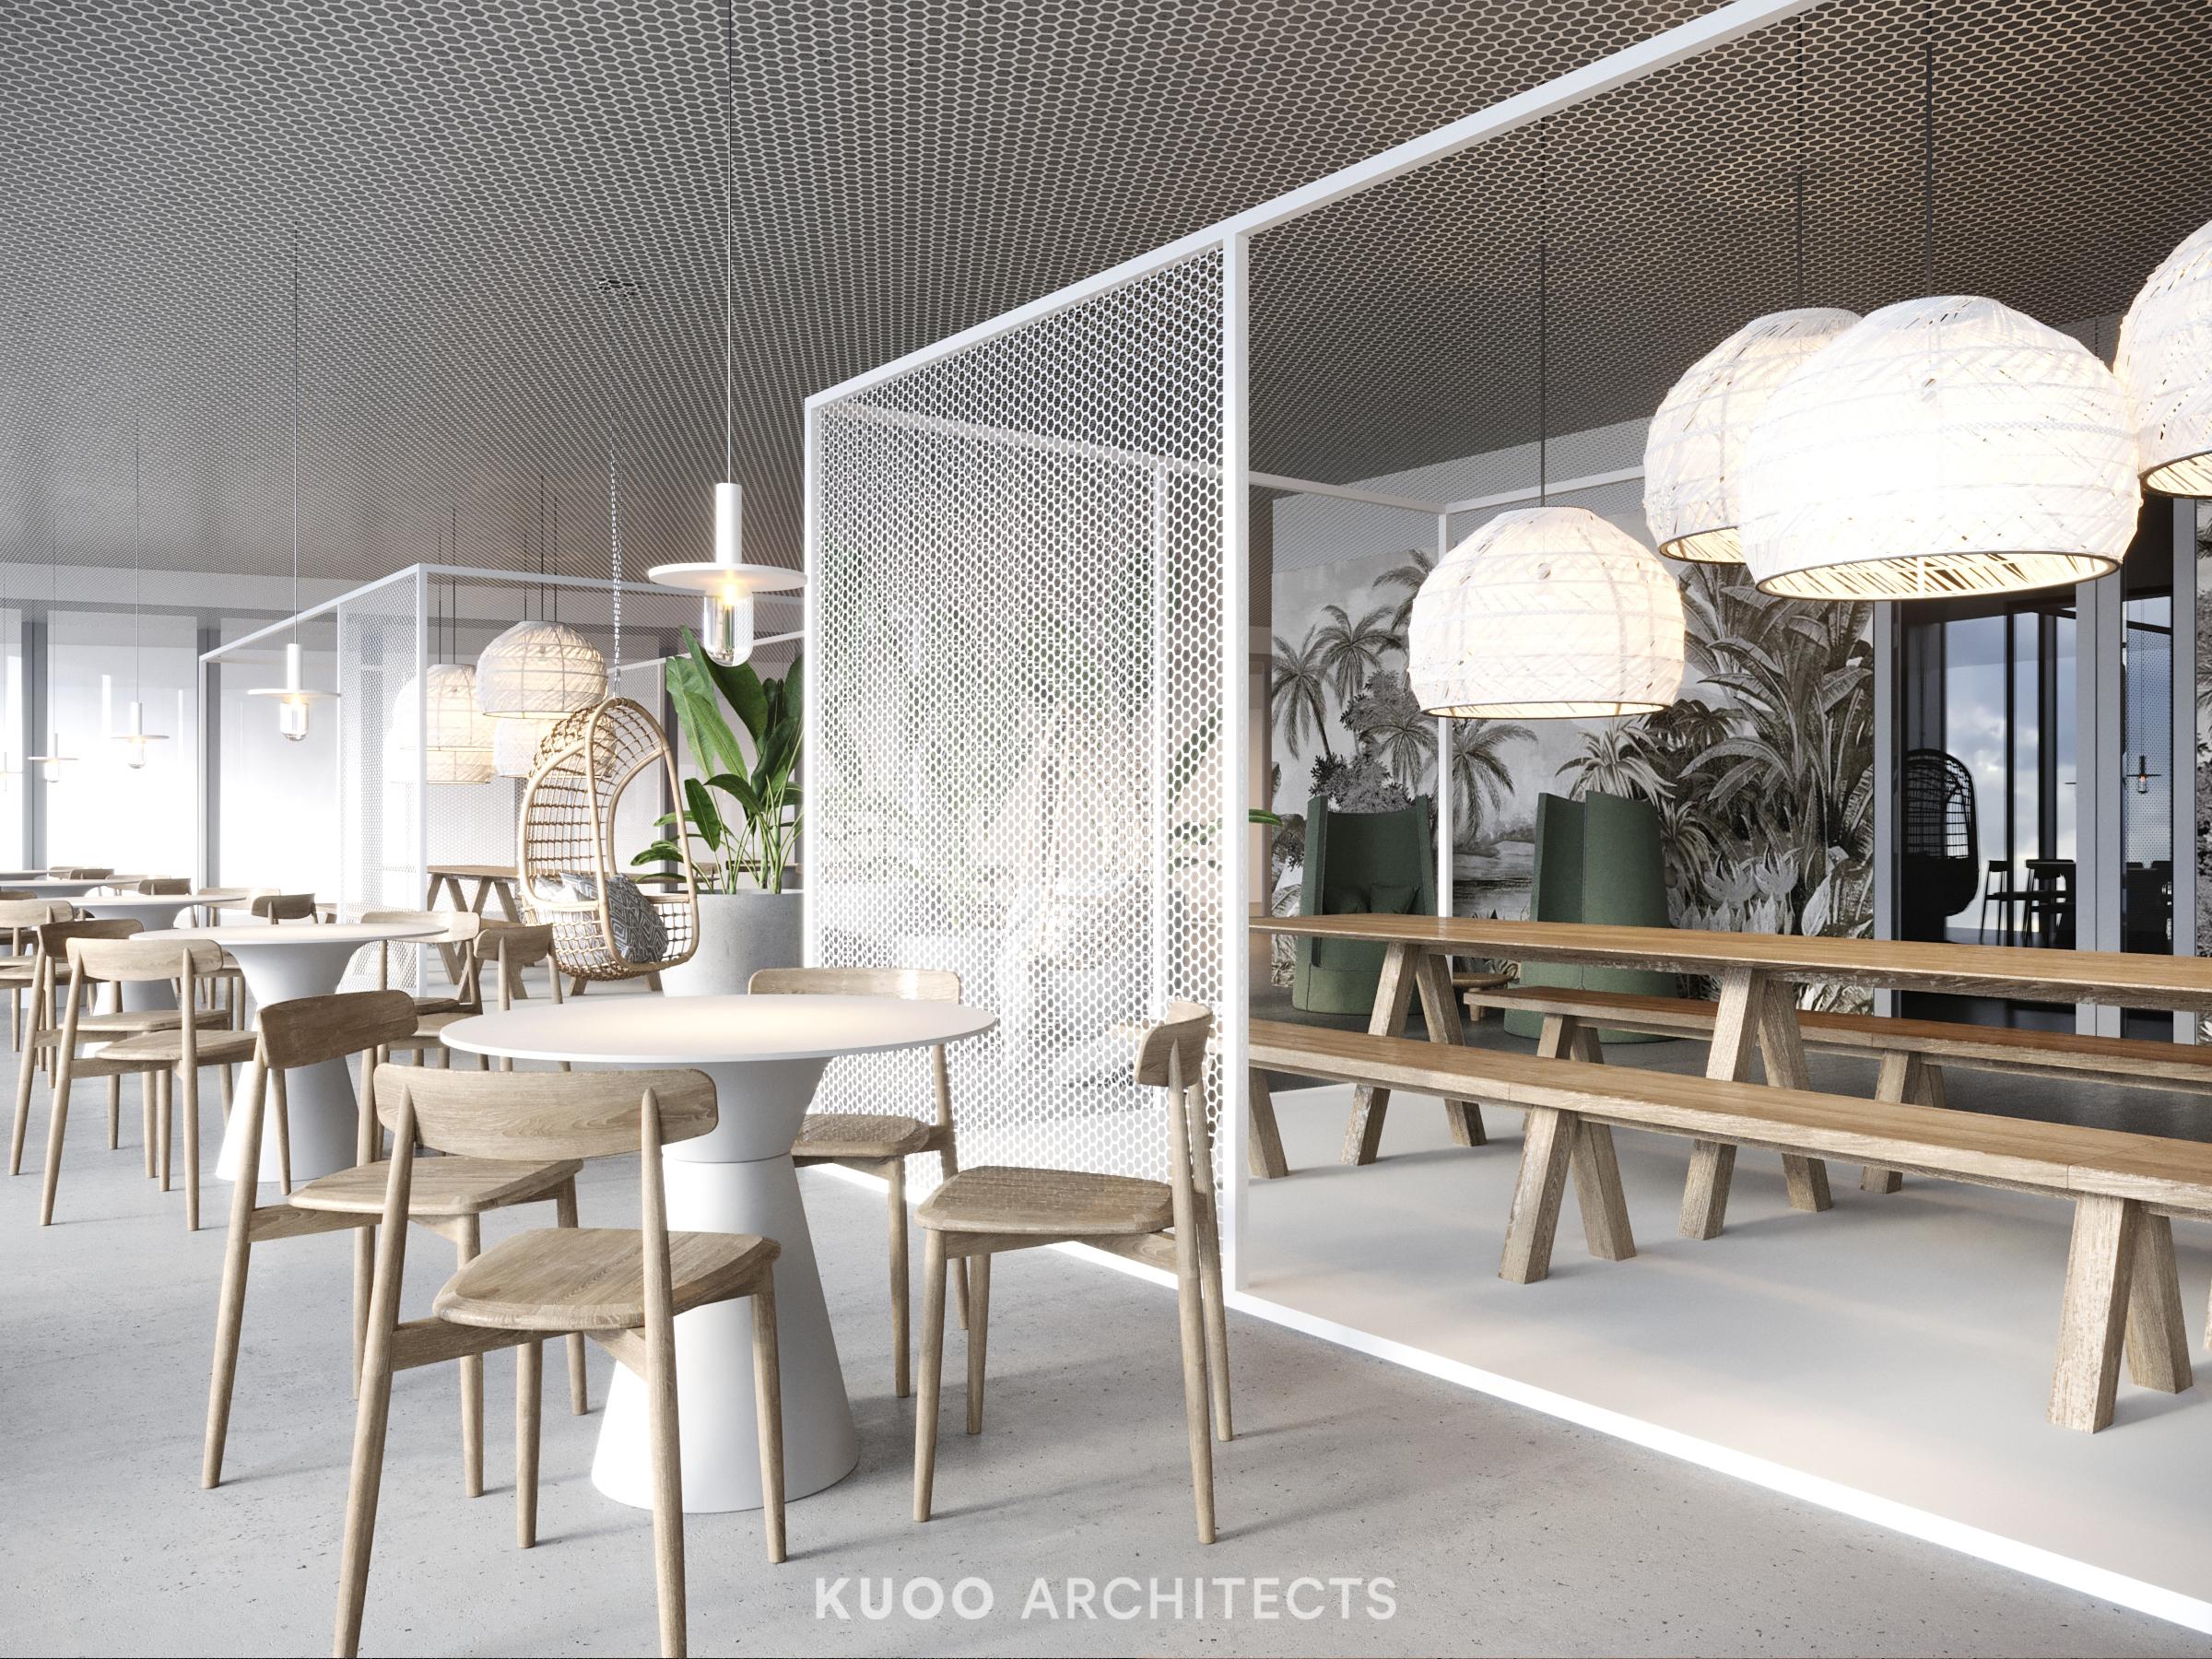 kuoo_architects_mcafe_4